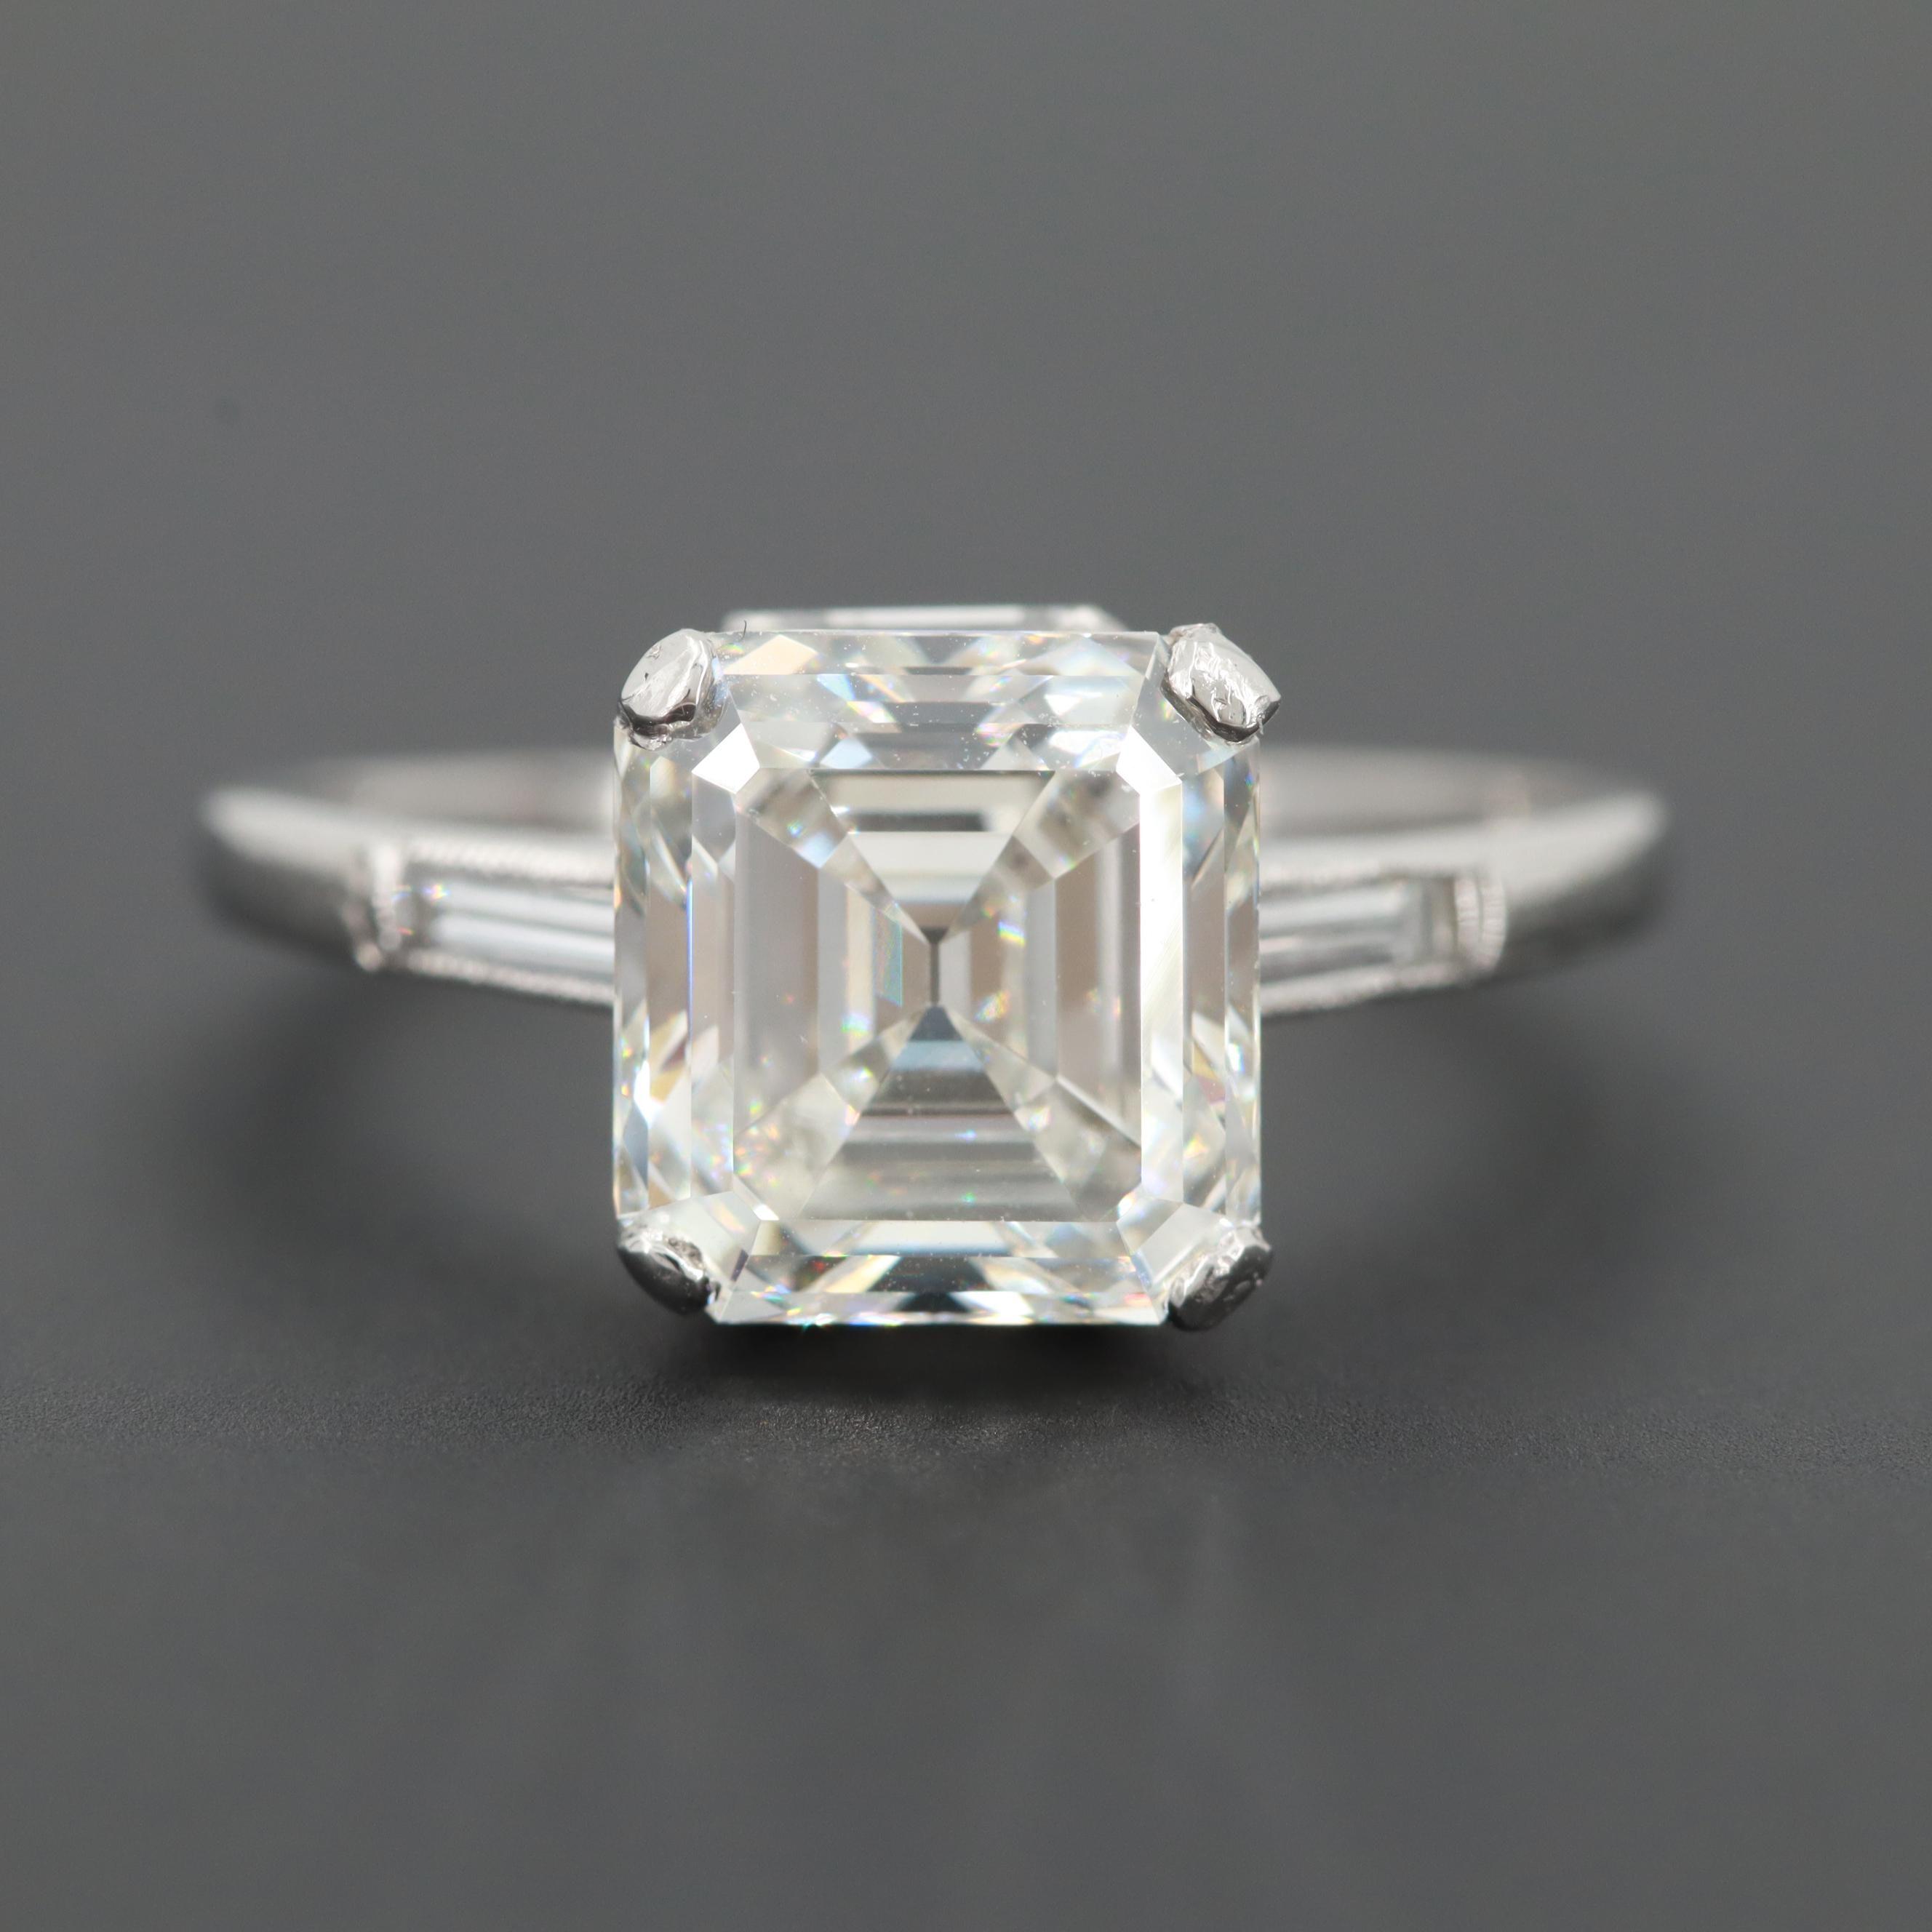 Platinum 3.37 CTW Diamond Ring with GIA Report